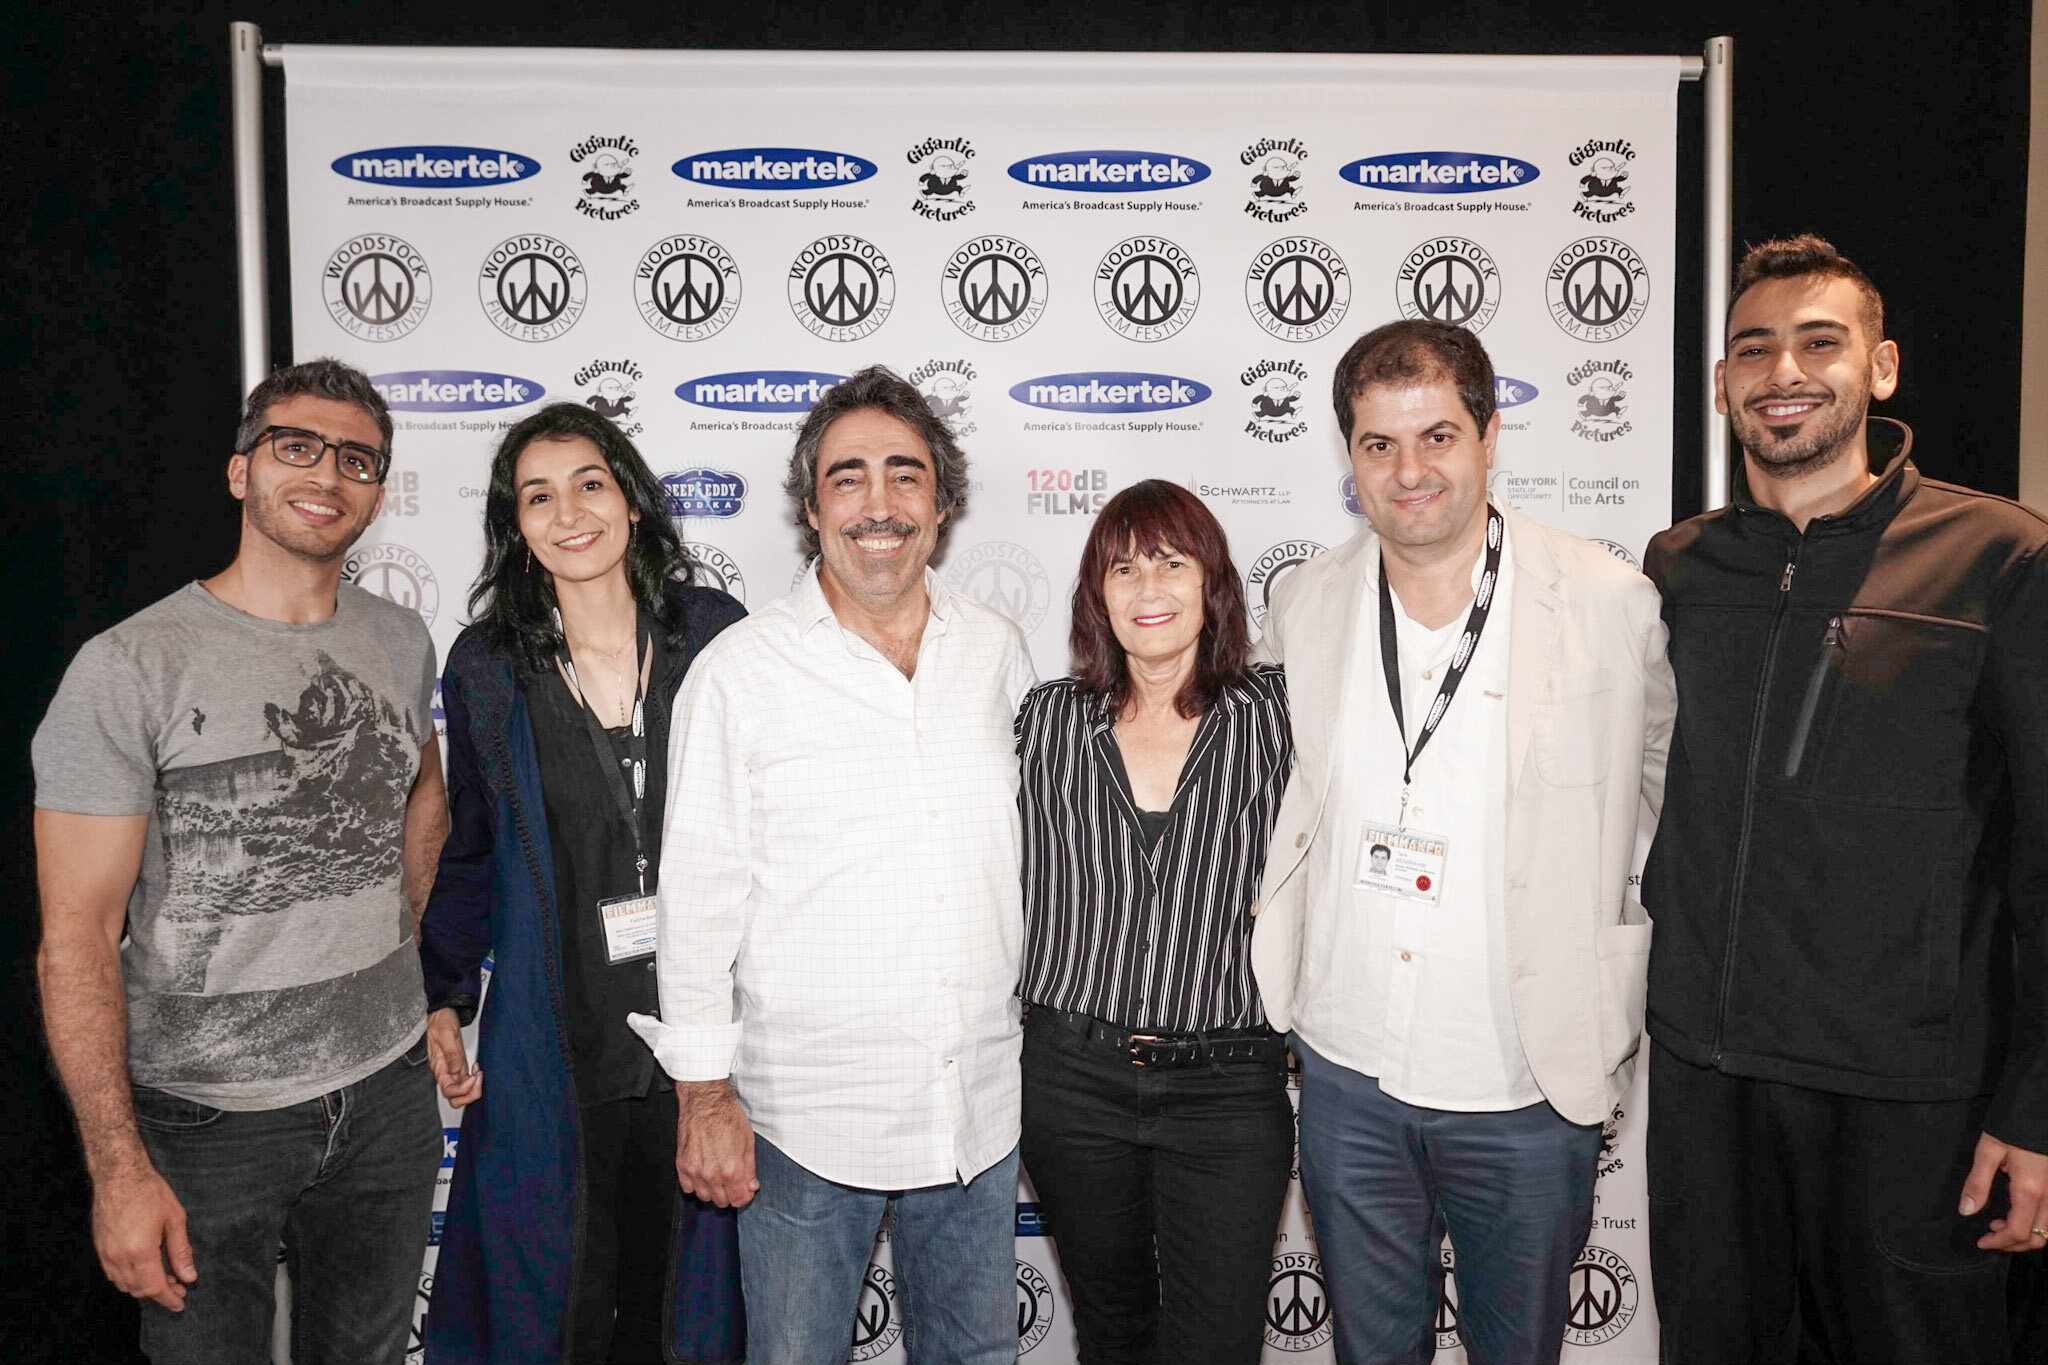 (From left) Tareq Rantisi, Simon Shaheen, Meira Blaustein, Tarik Benbrahim and Firas Zreik at the event